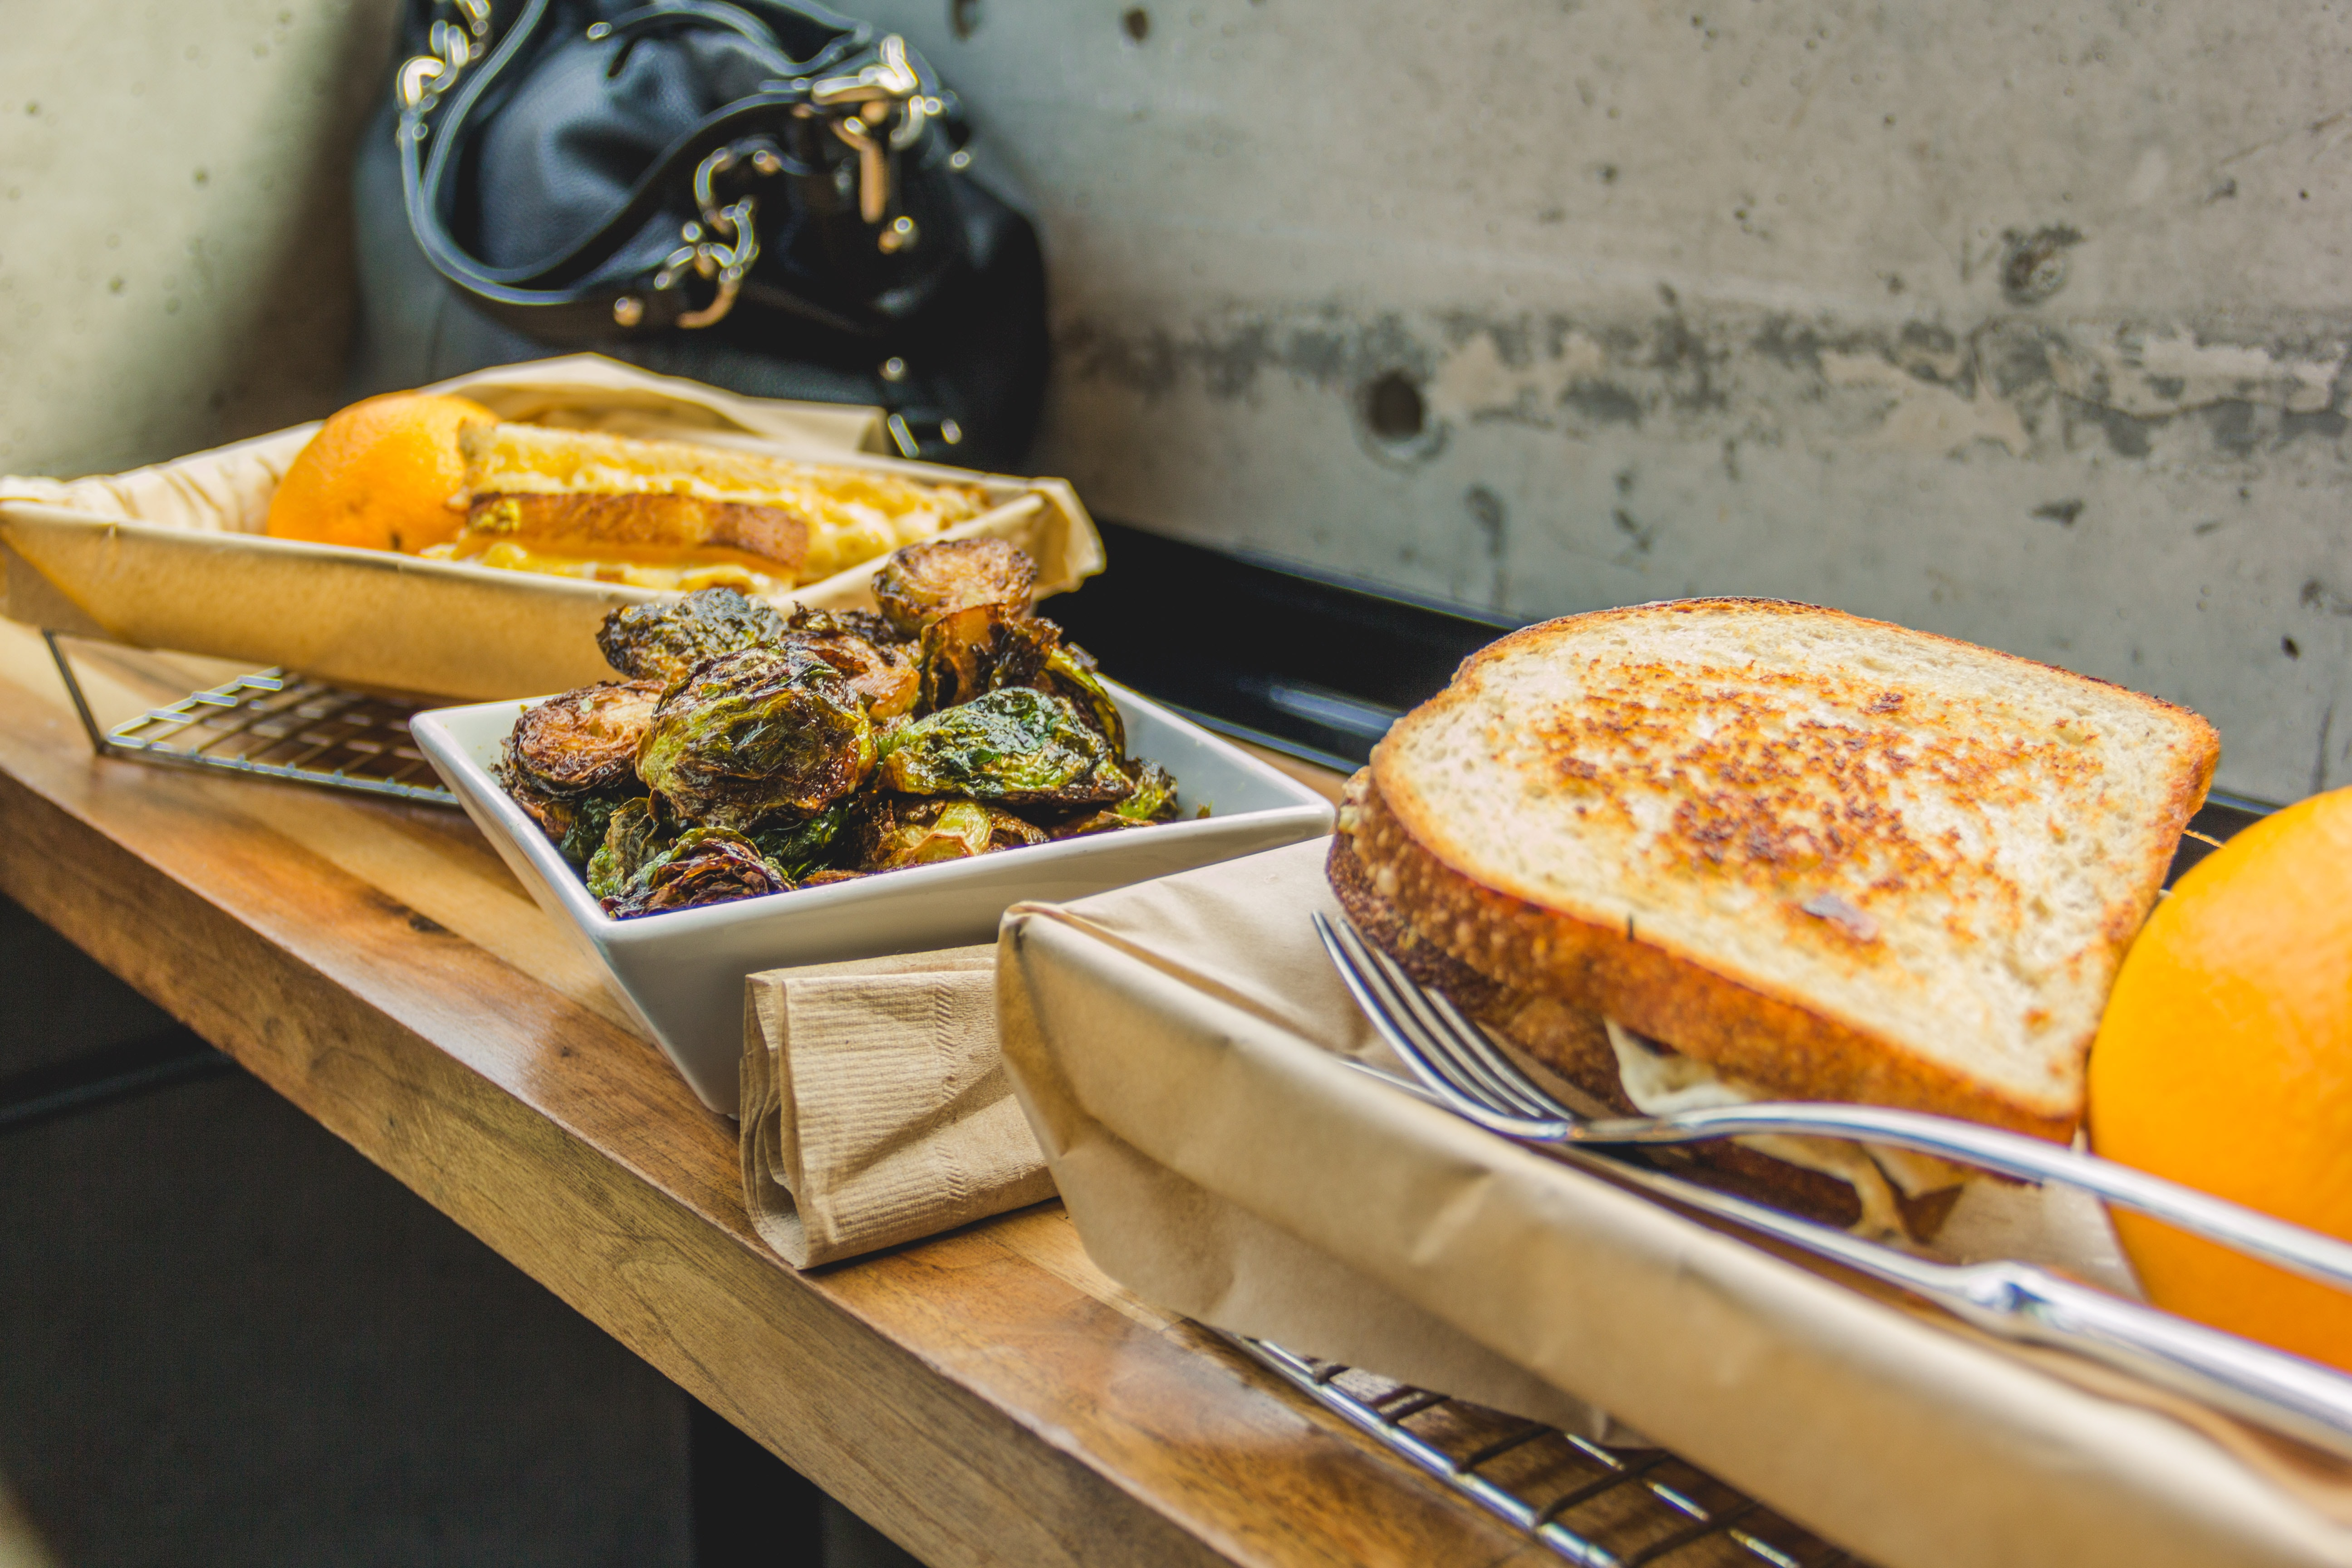 baked bread on metal basket near white wall